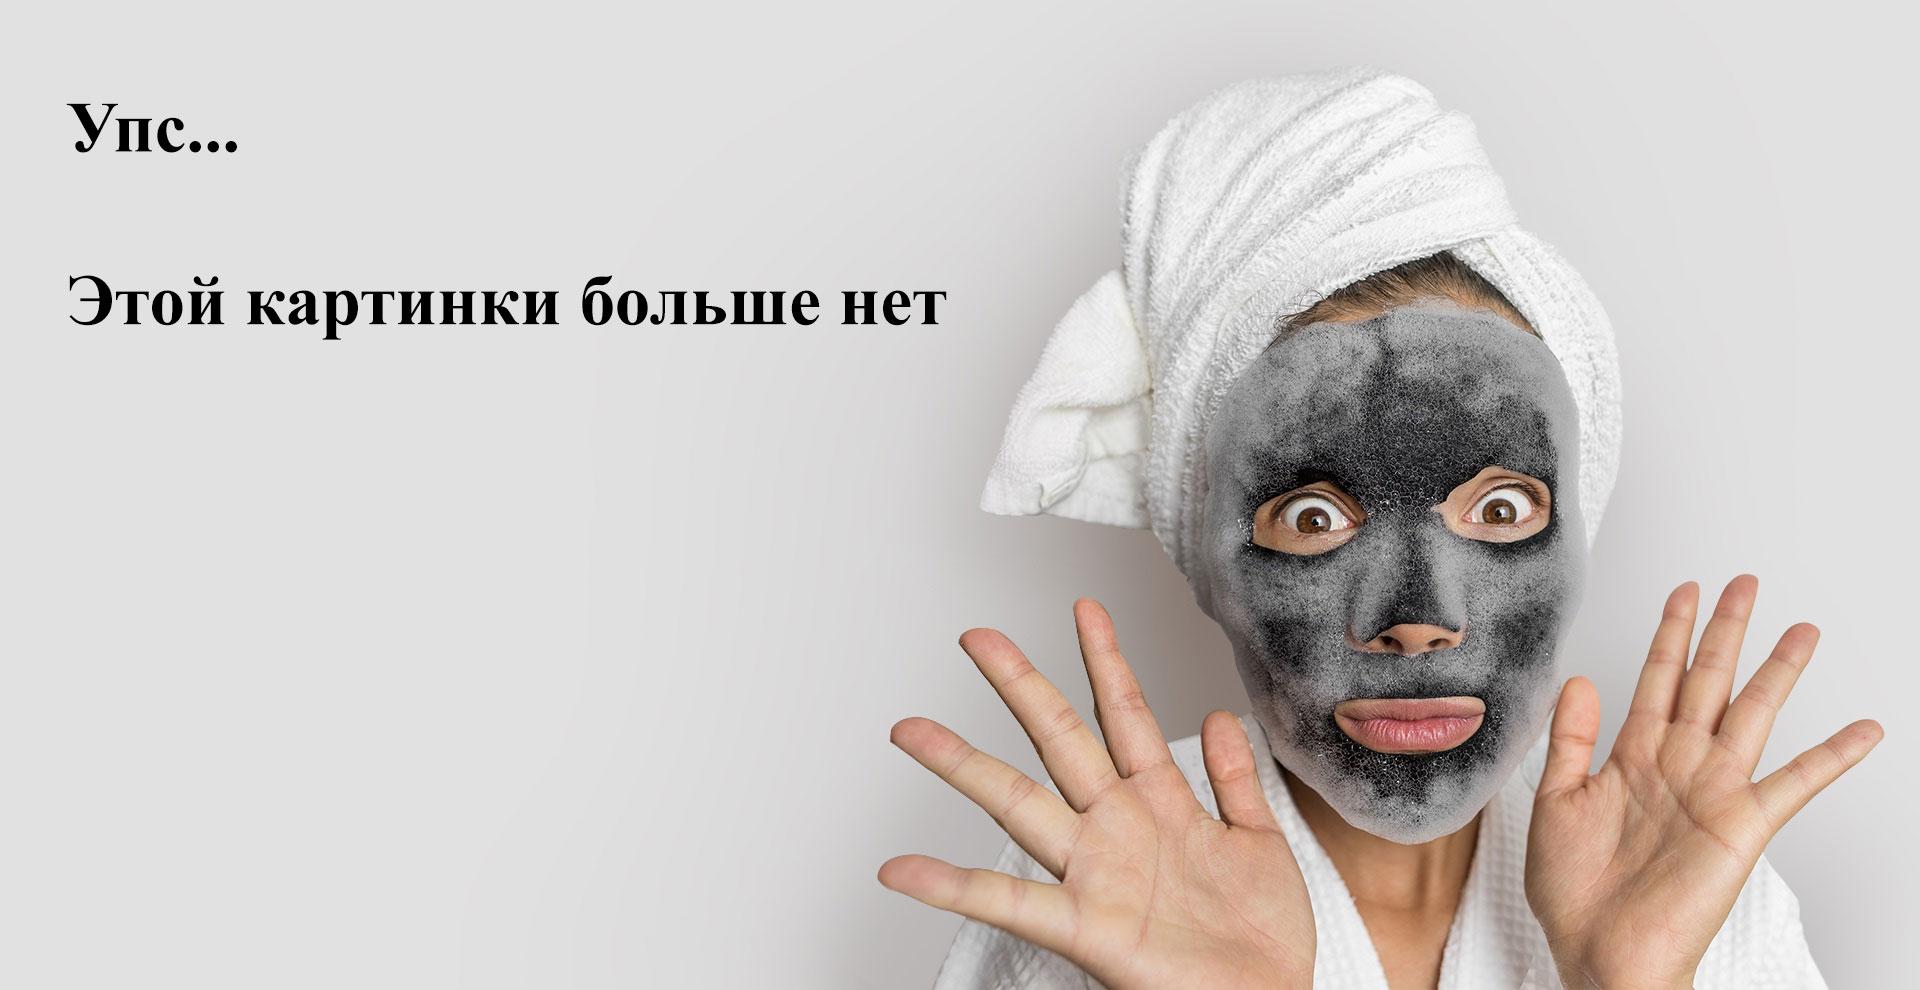 Patrisa Nail, Гель-лак Московская сага №747